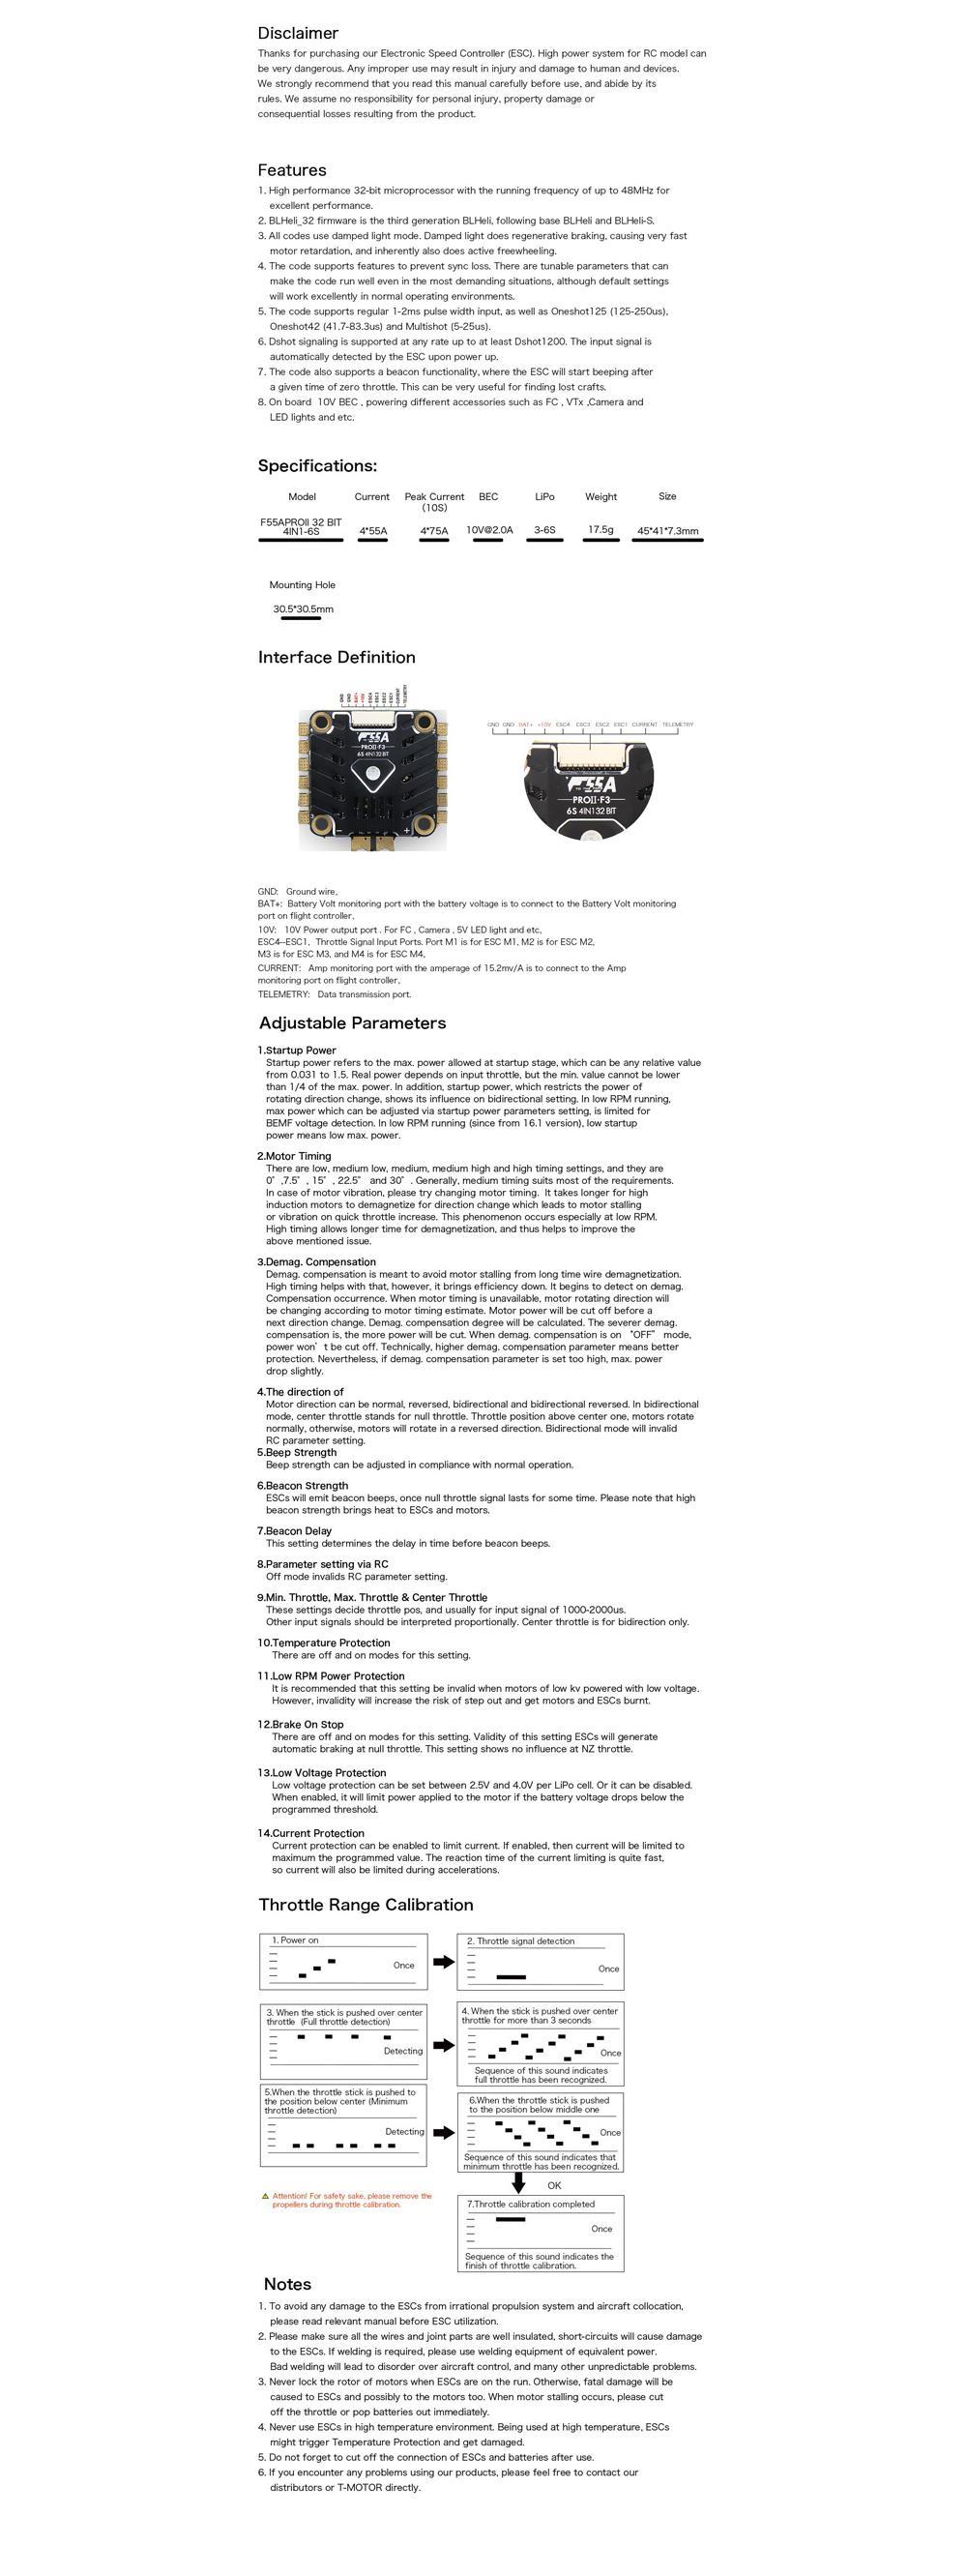 Specs of the Motor F55 4 IN 1 ESC